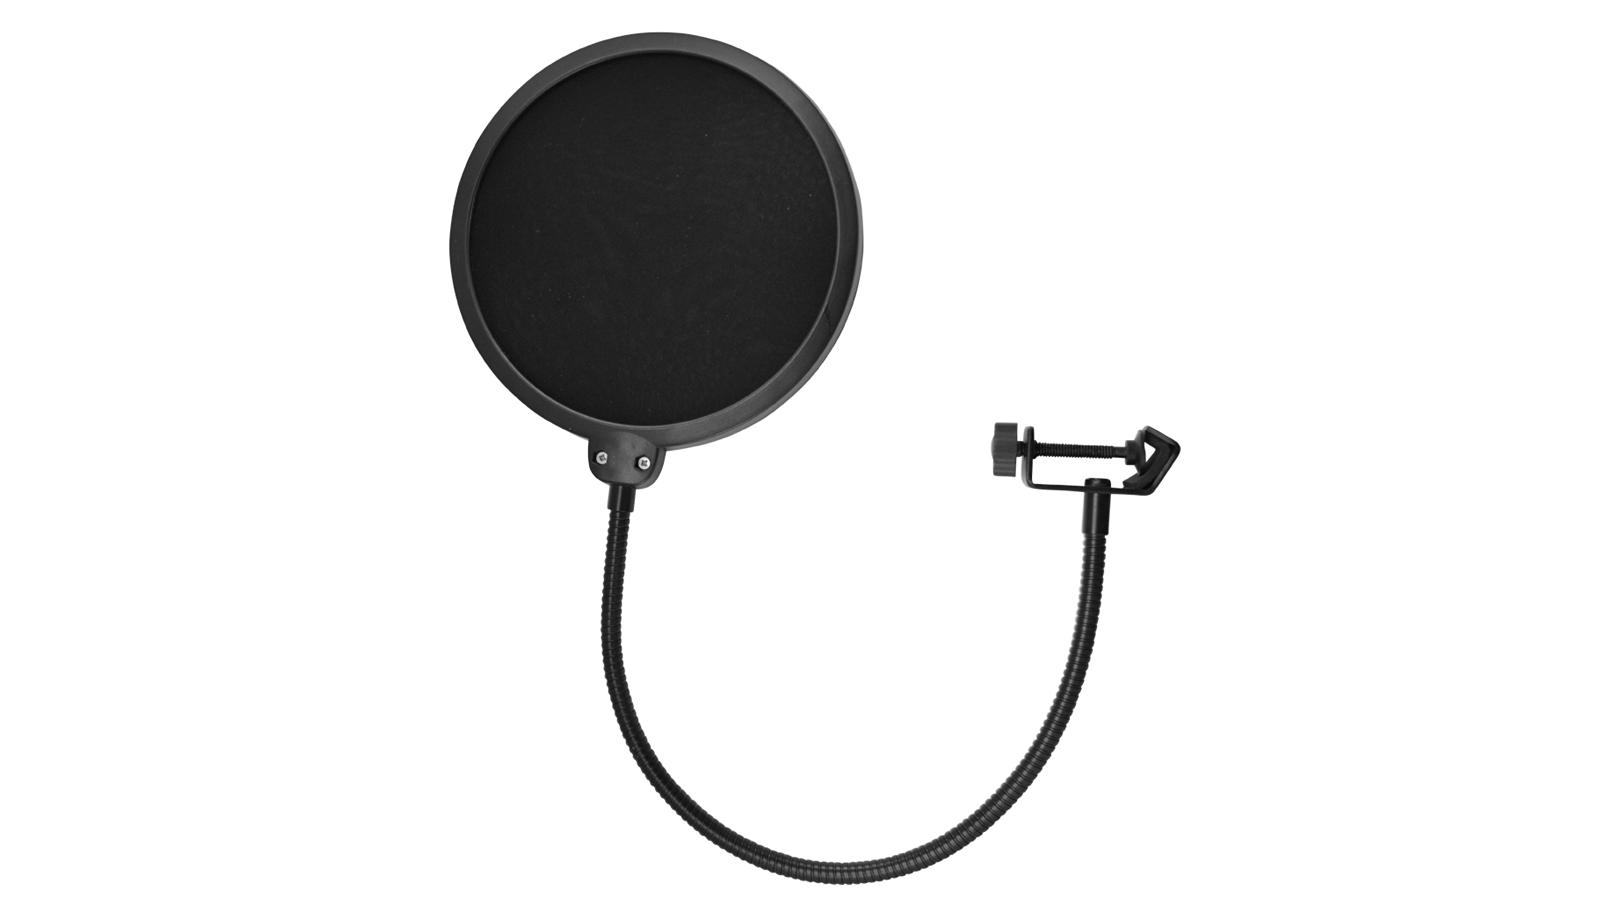 Tie Audio Popfilter